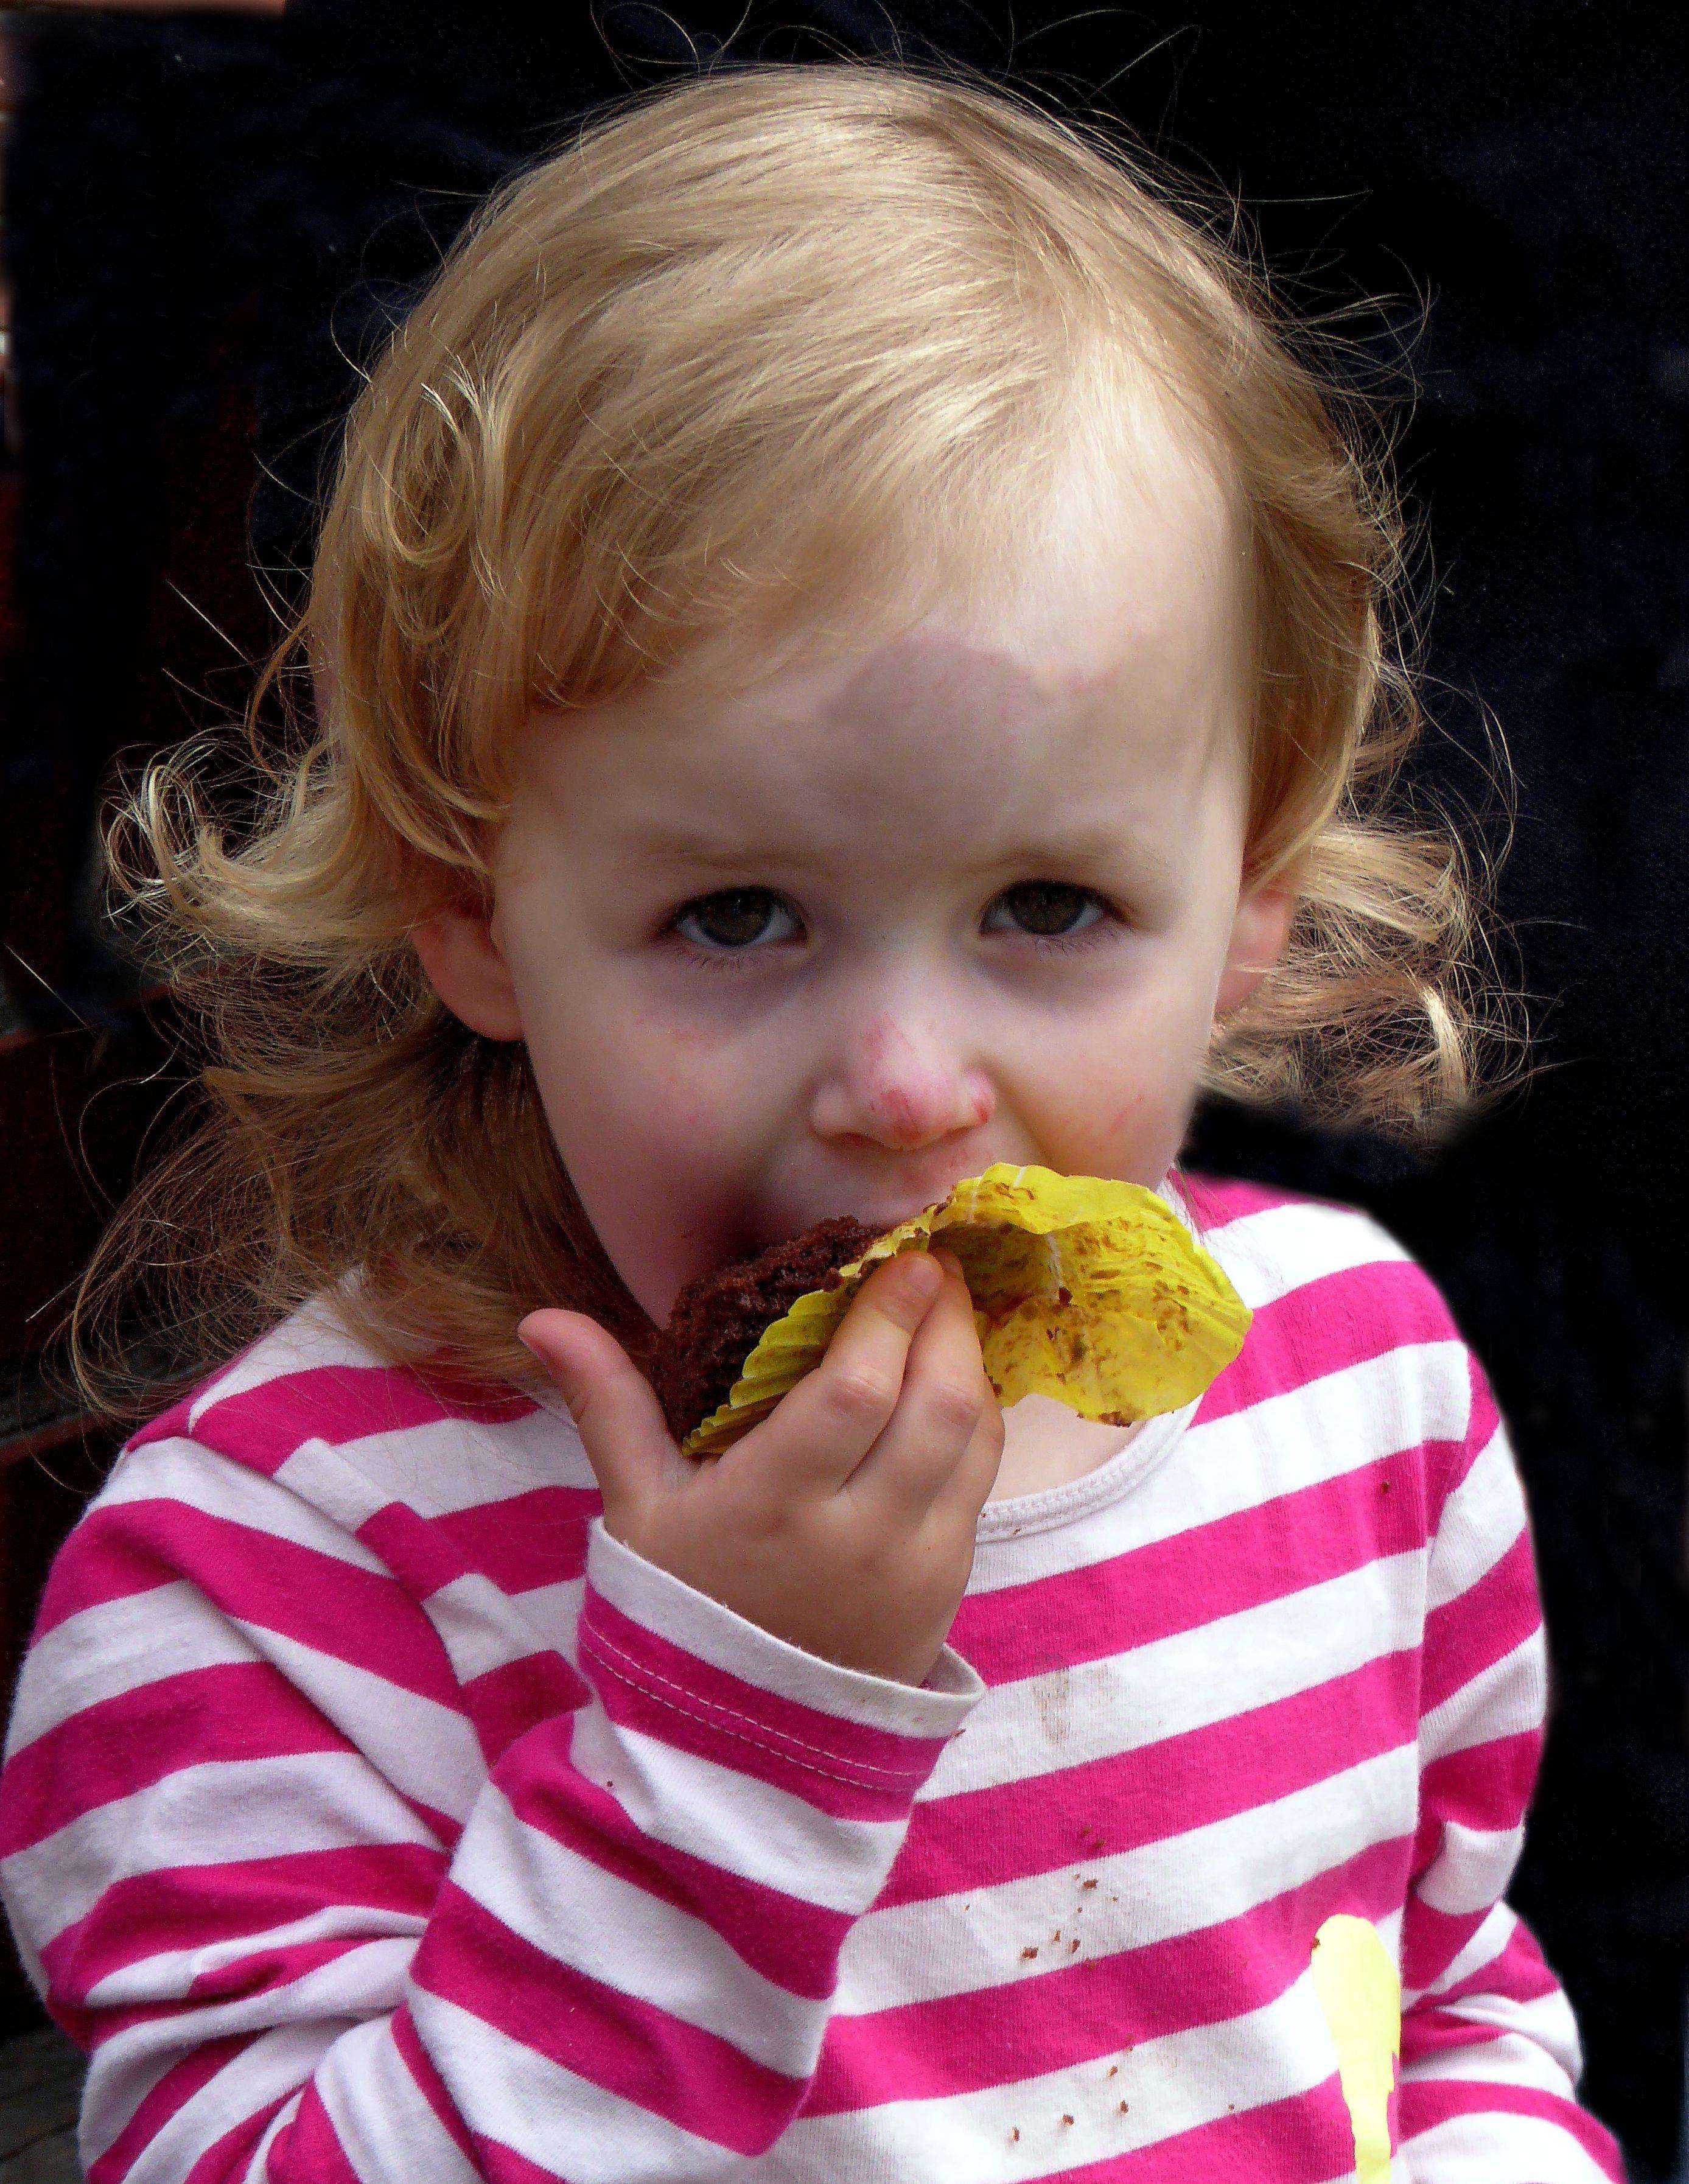 Kostenlose foto Person Haar niedlich Porträt Kind Rosa